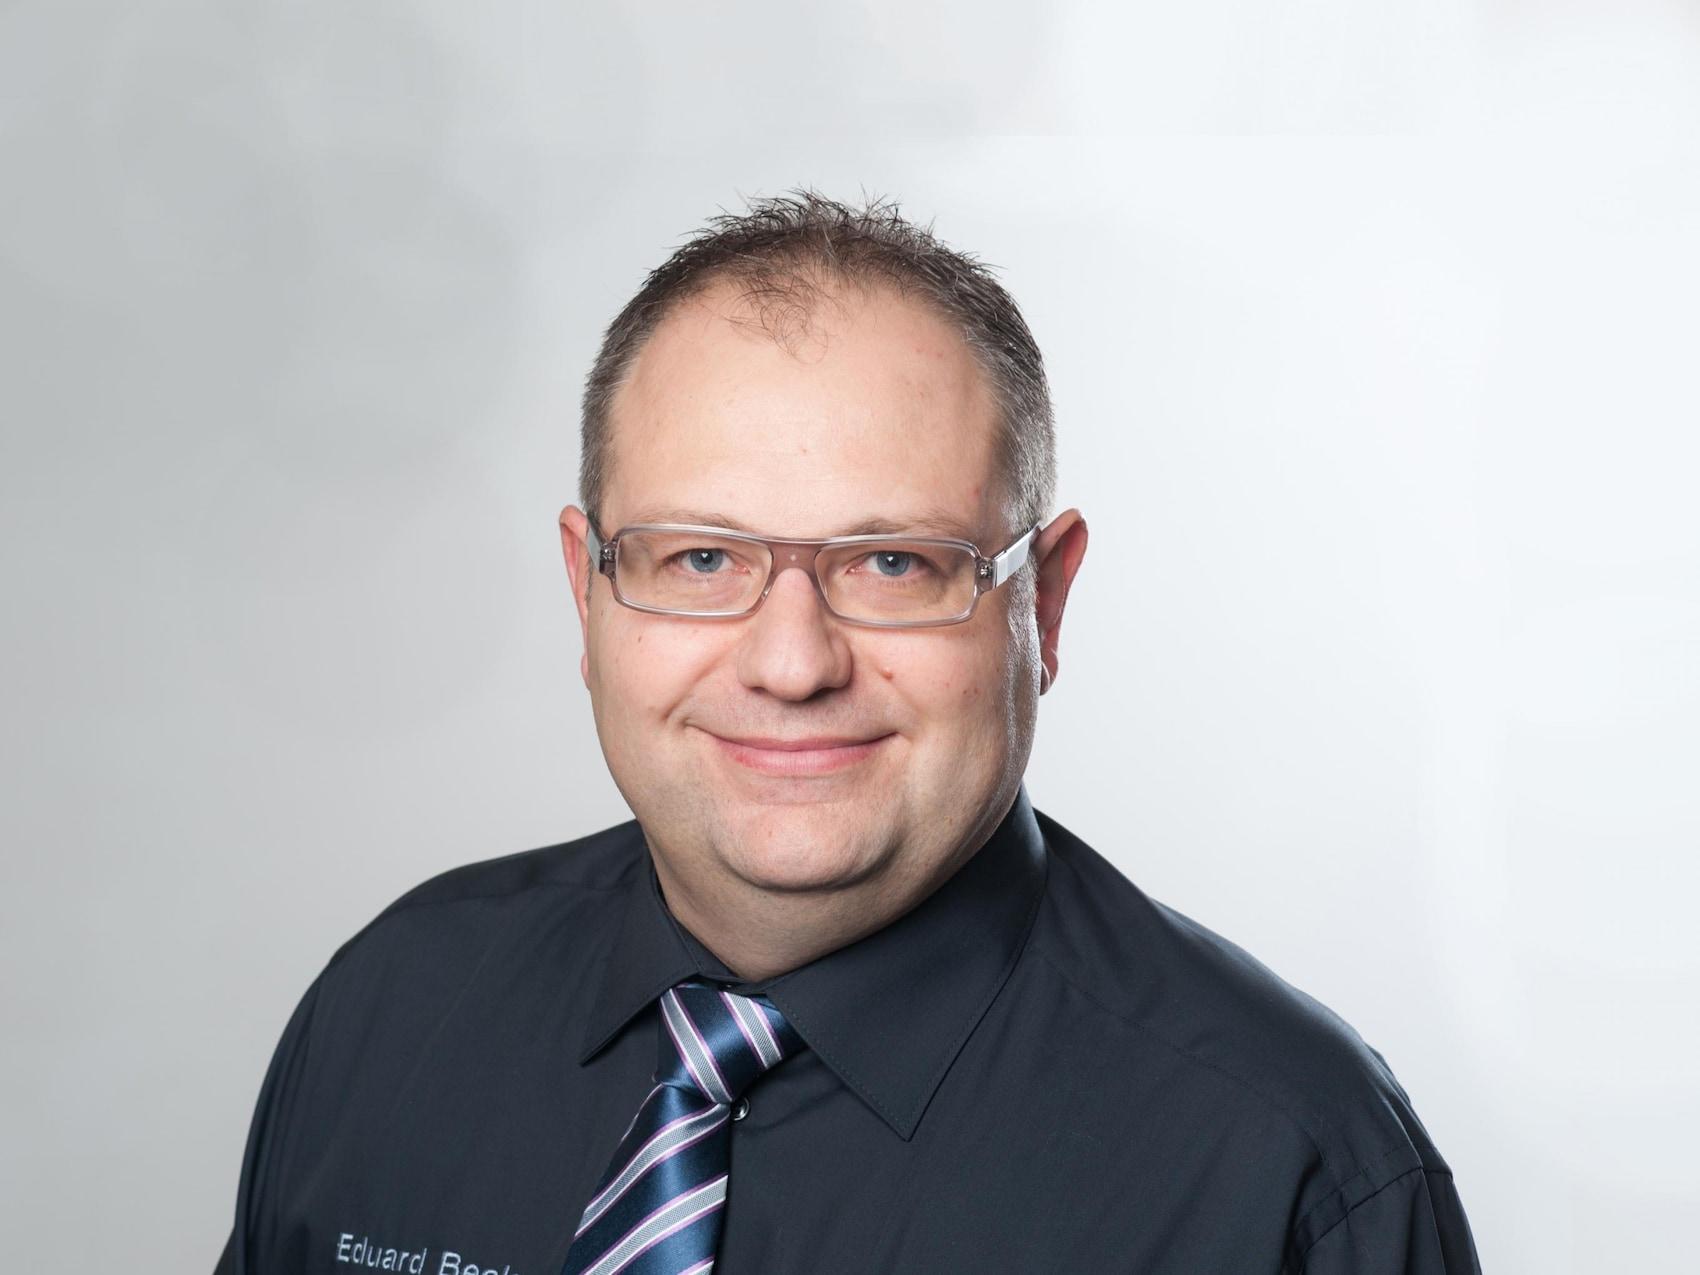 team-sc-freiburg-becker-eduard